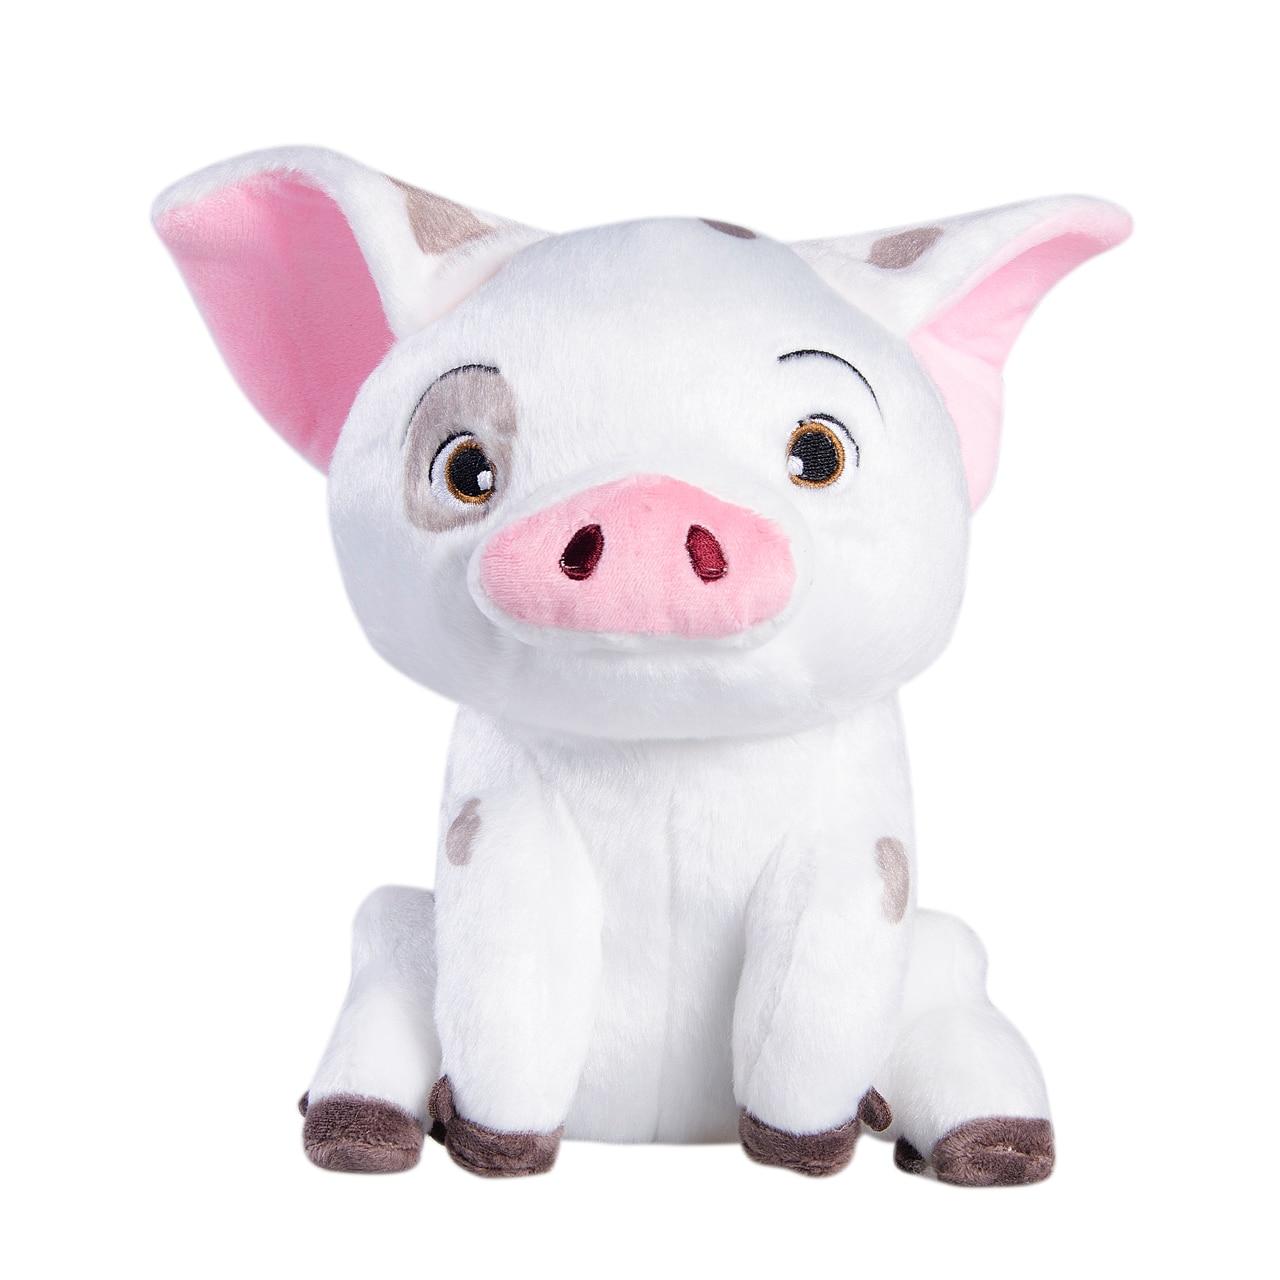 NEW Moana Pet Pig Pua Stuffed Animals Cute Cartoon Plush Toy Dolls 8 20 CM Kids Movie Collection Toys 2017 new super wings plush toys 20 30 cm cute cartoon soft stuffed dolls kids gift